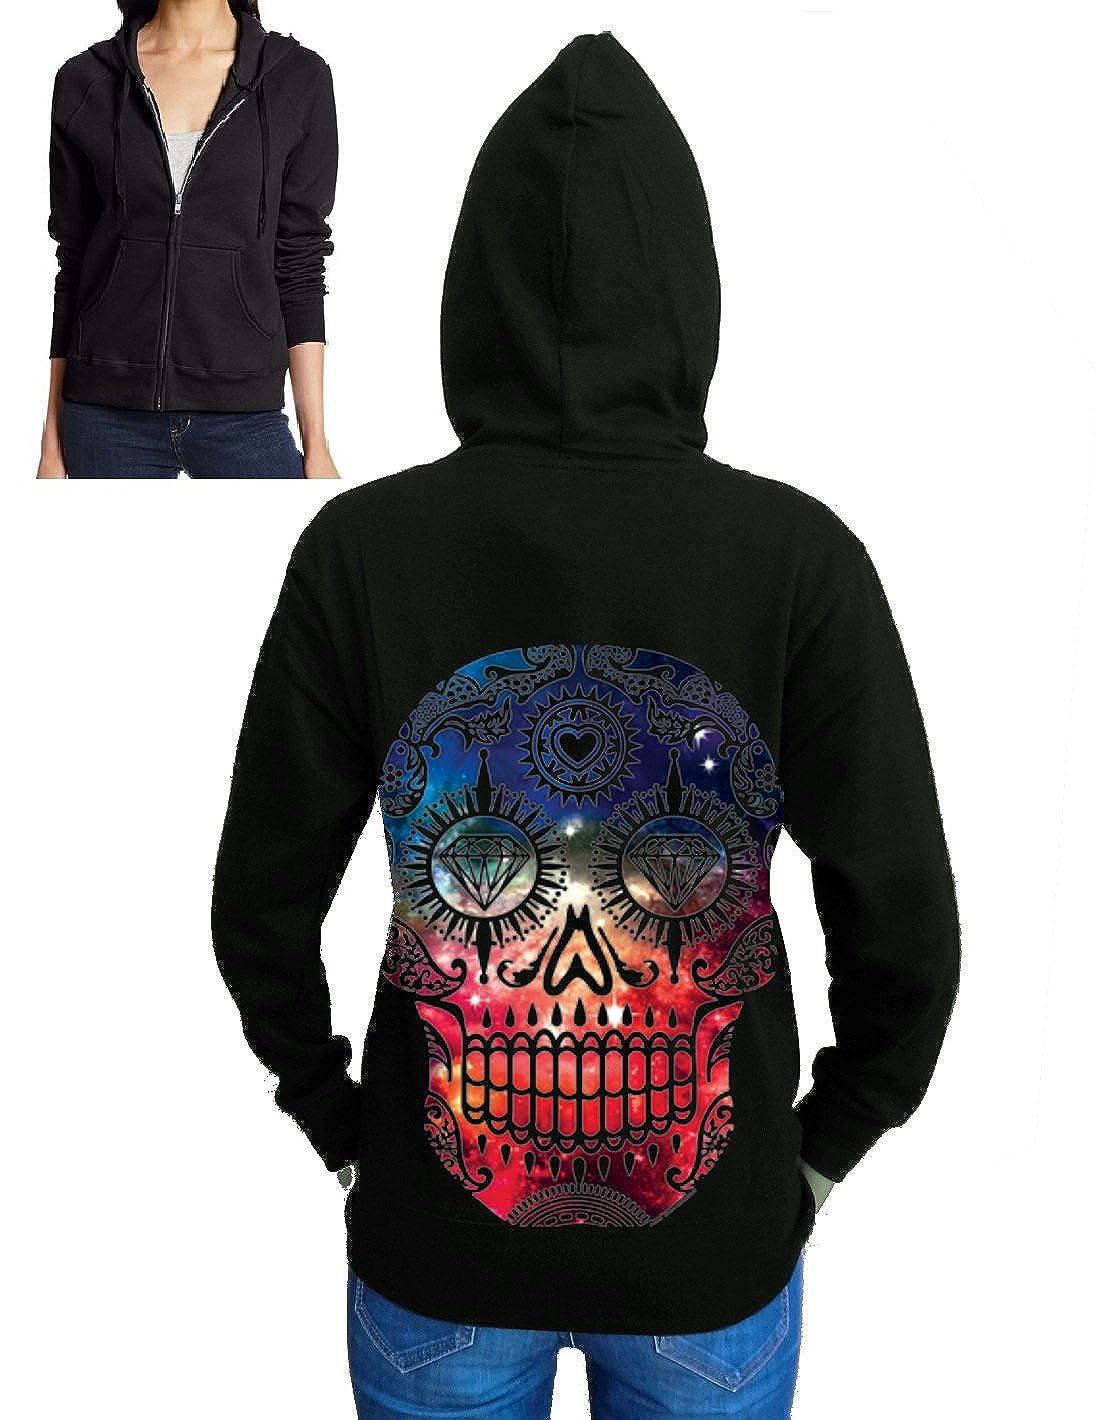 New Galaxy Skull Zipper Hoodie Fleece Juniors S-2XL Black